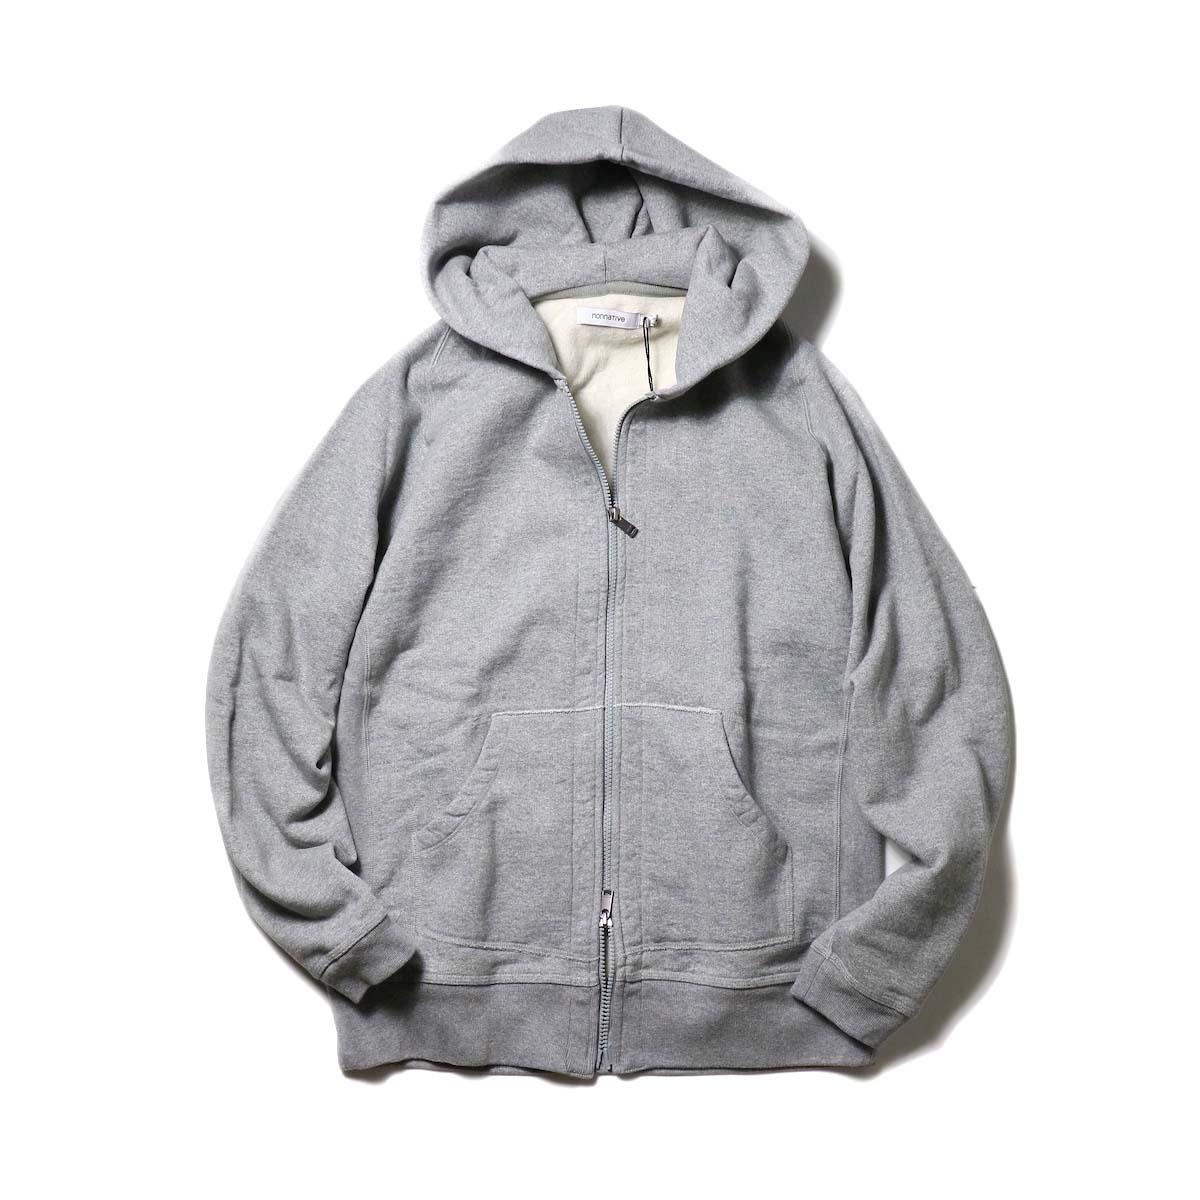 nonnative / DWELLER FULL ZIP HOODY COTTON SWEAT (Gray)